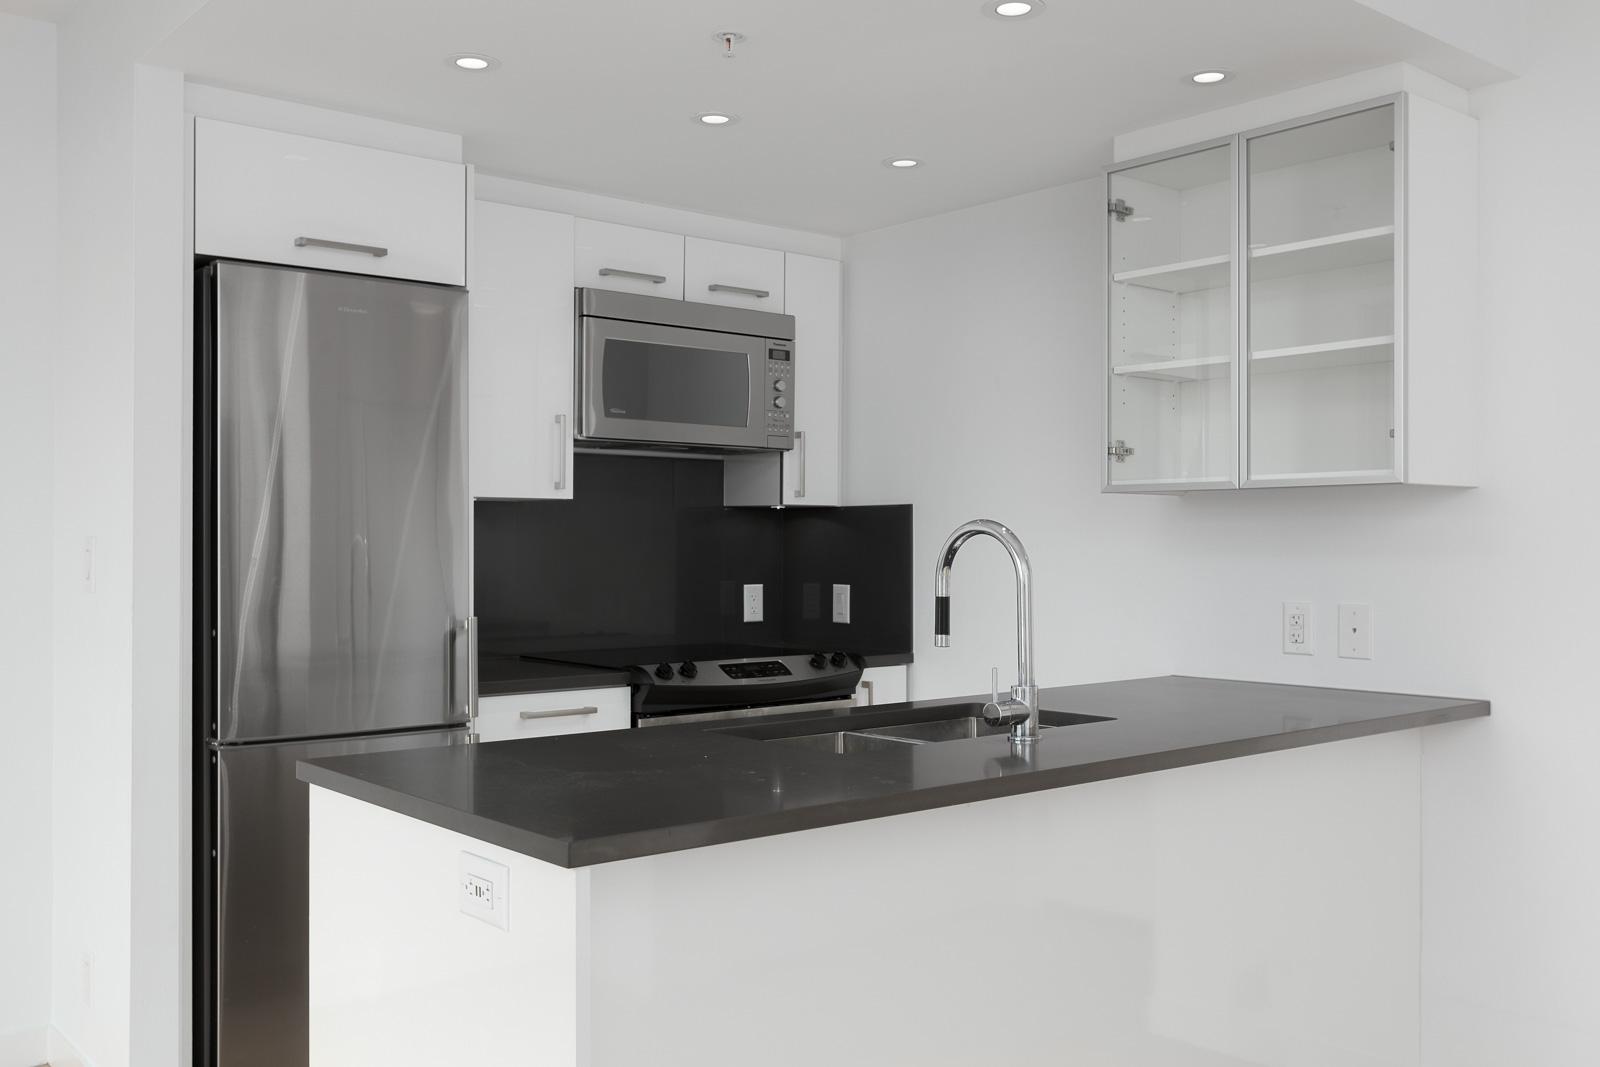 grey colour scheme with all the essential kitchen appliances